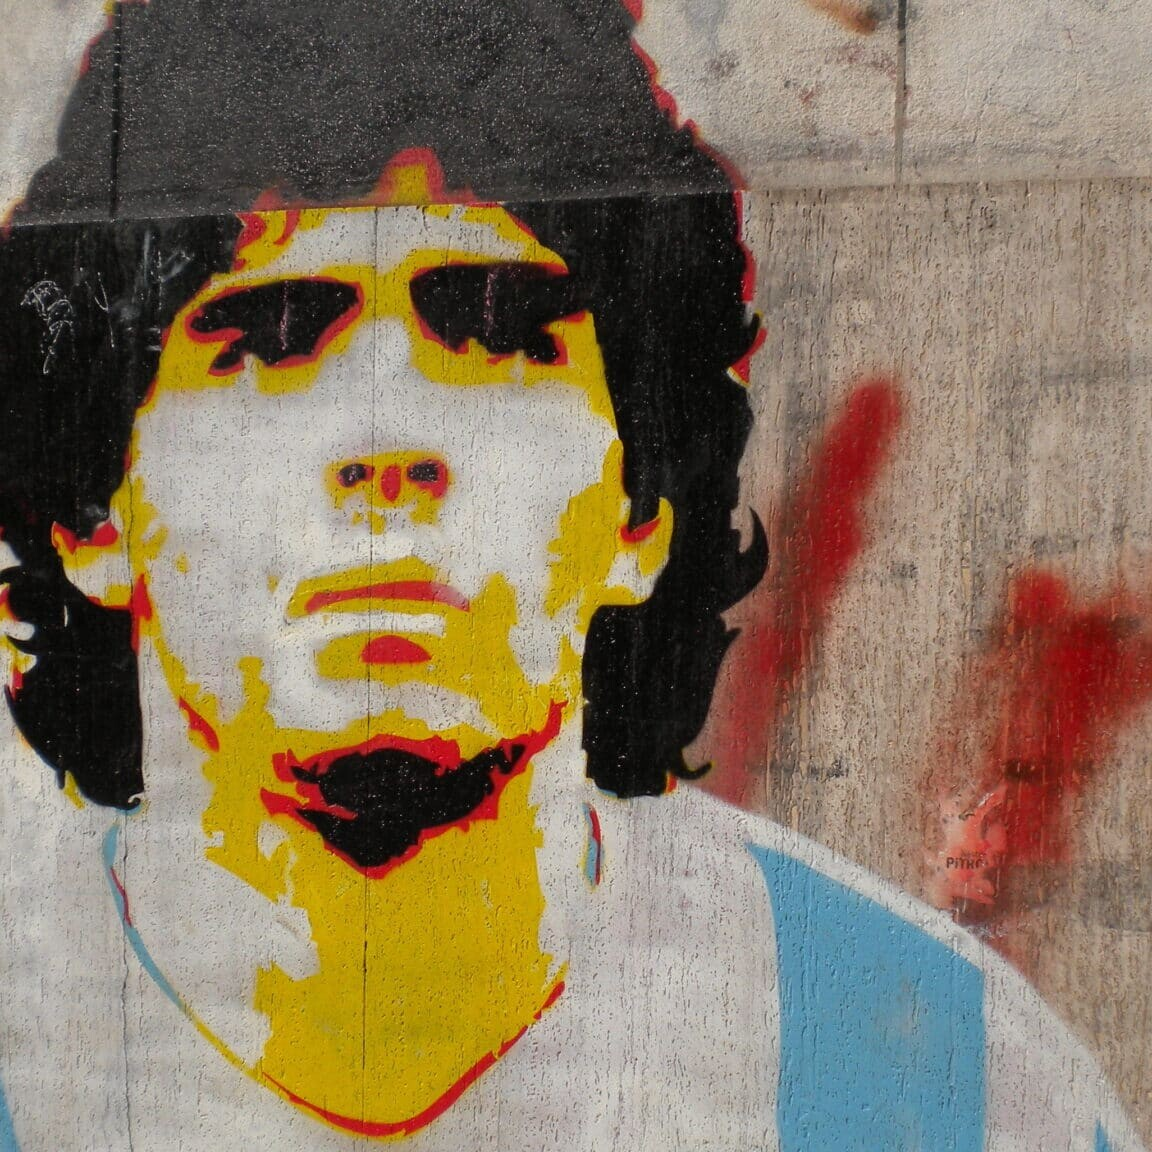 Maradona, pallone e potere